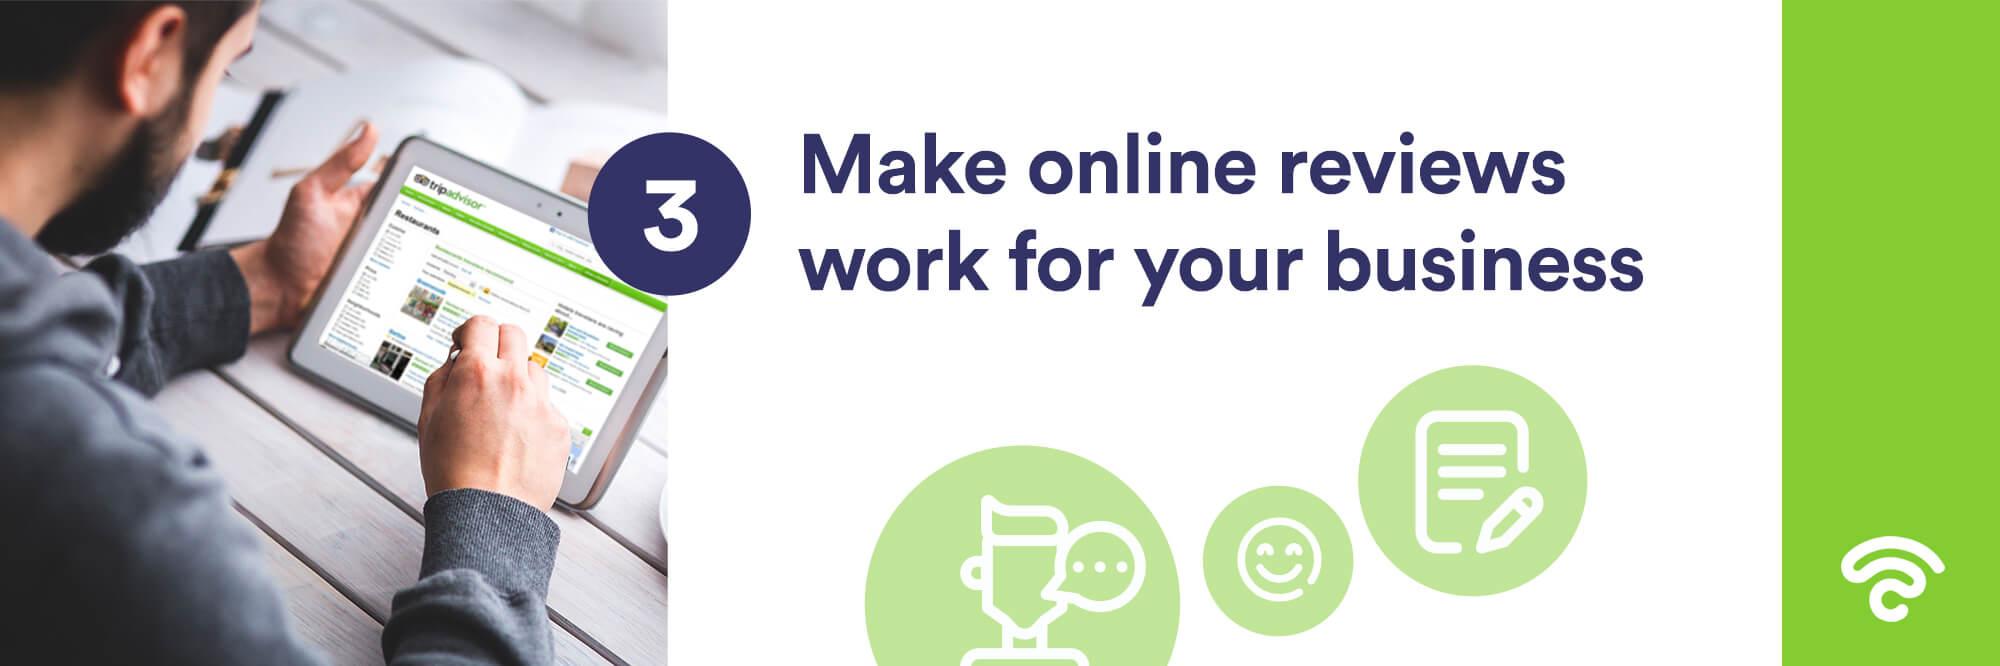 managing online restaurant reviews